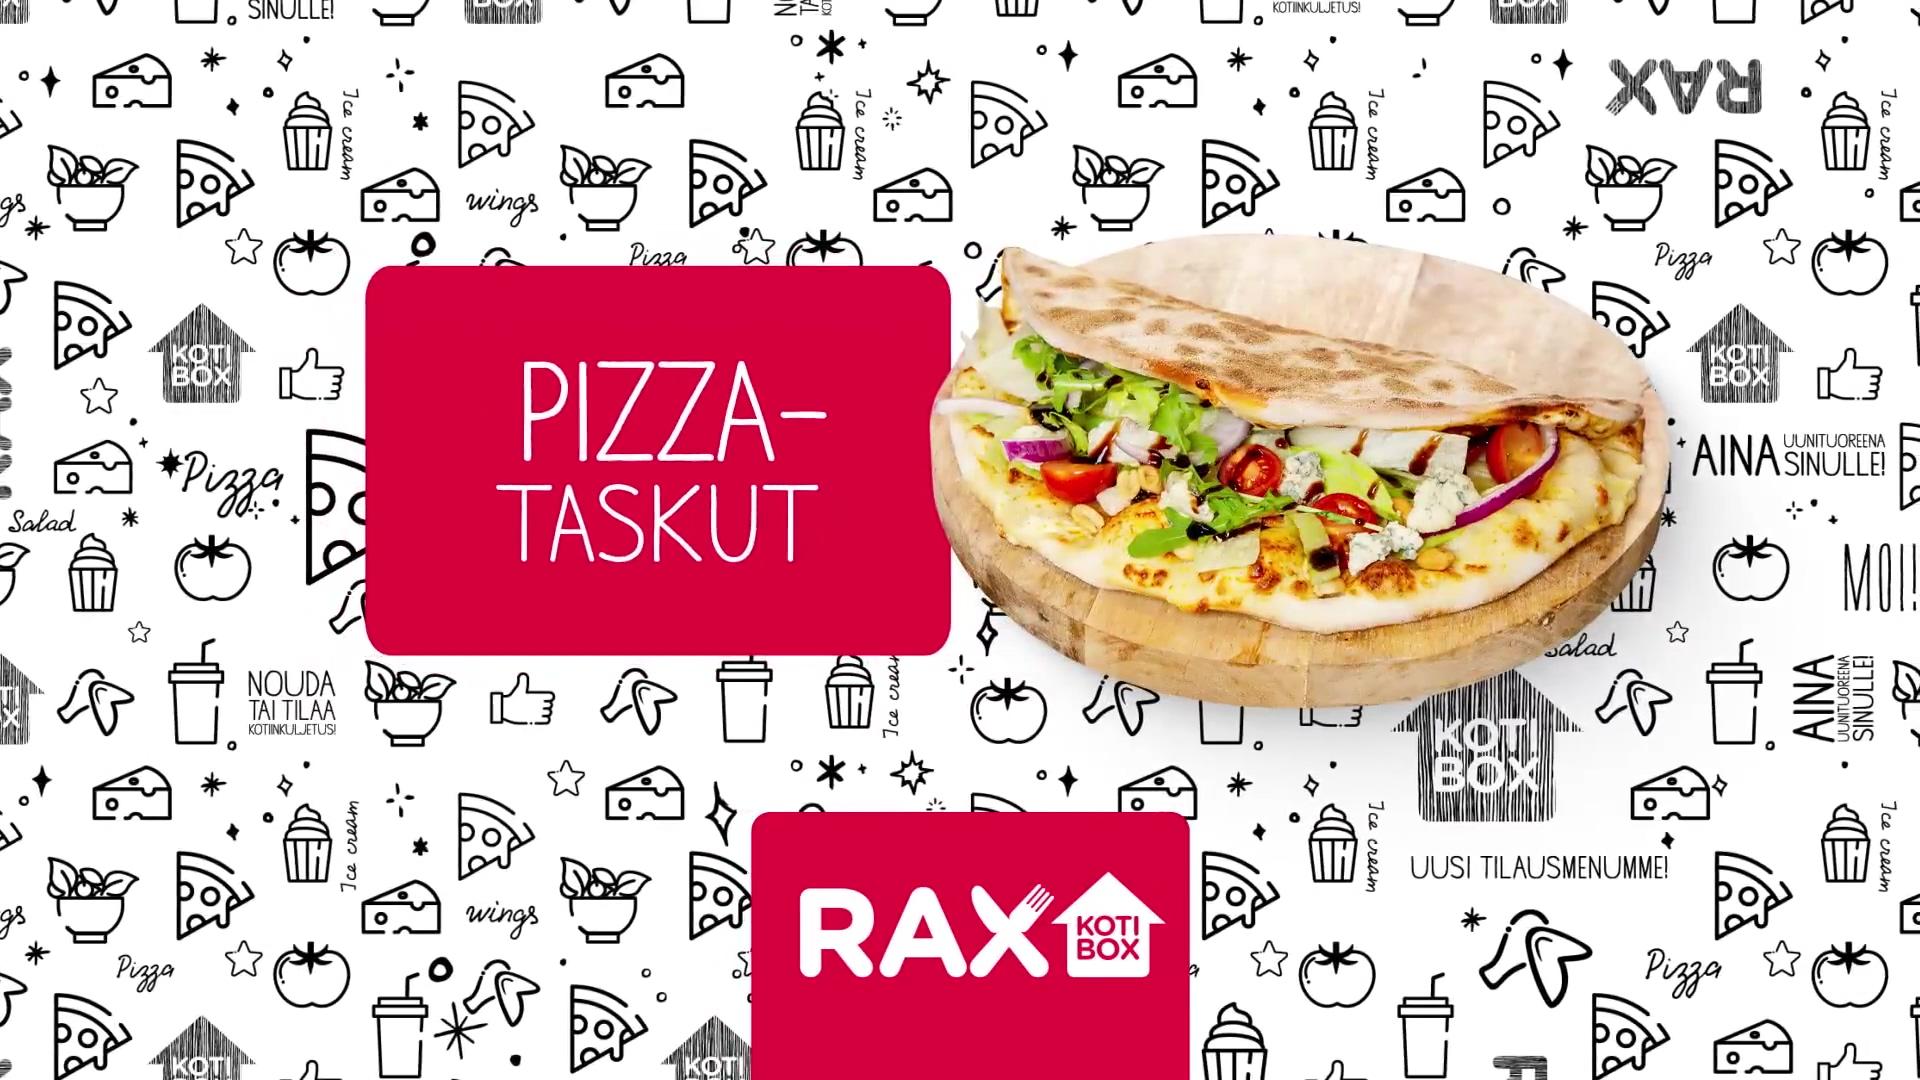 RAX - Putous Kotibox